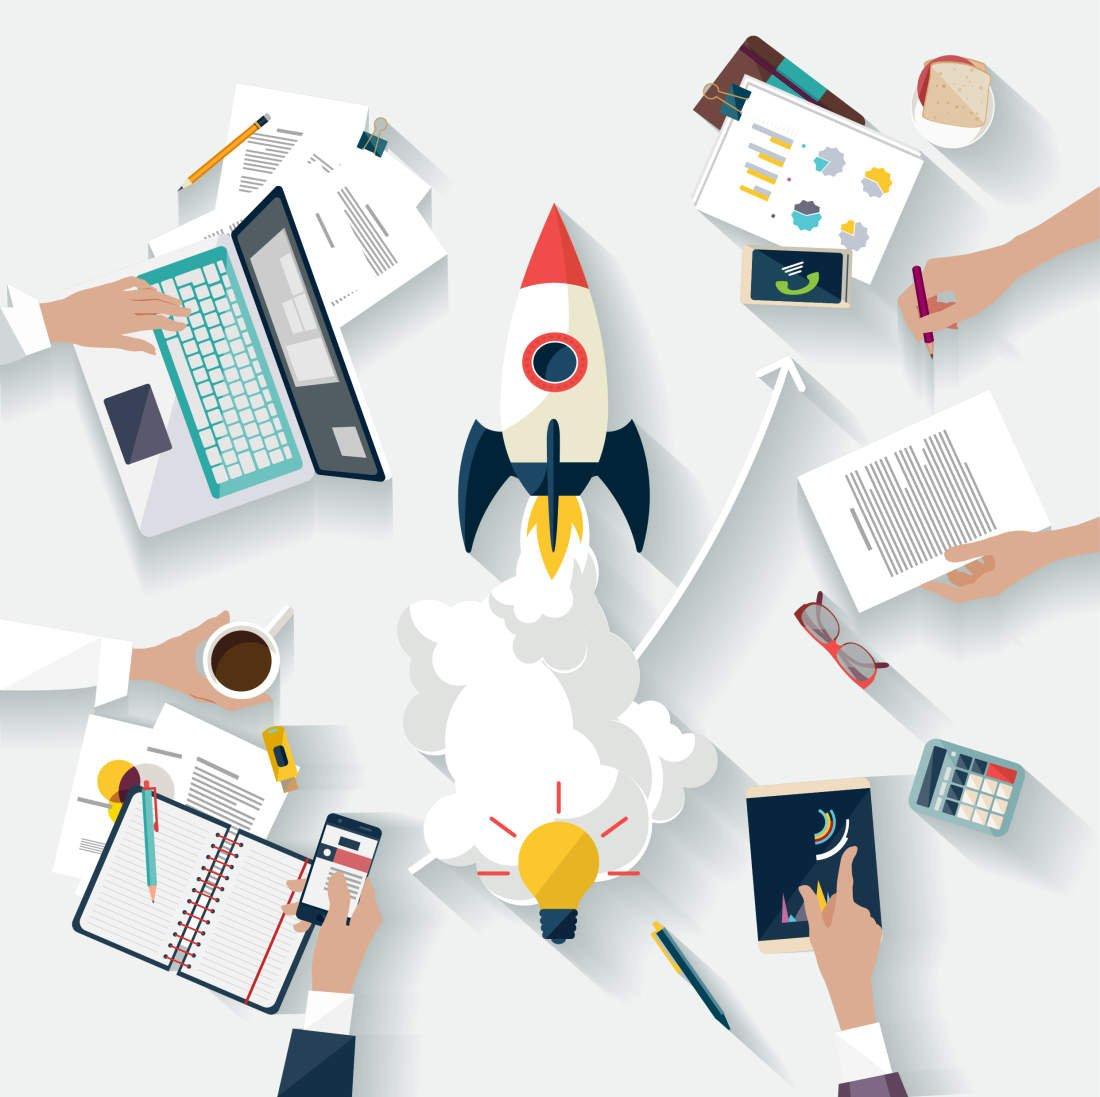 Top_12_Project_Management_Platforms_for_Startups_Outsourcing_Development_